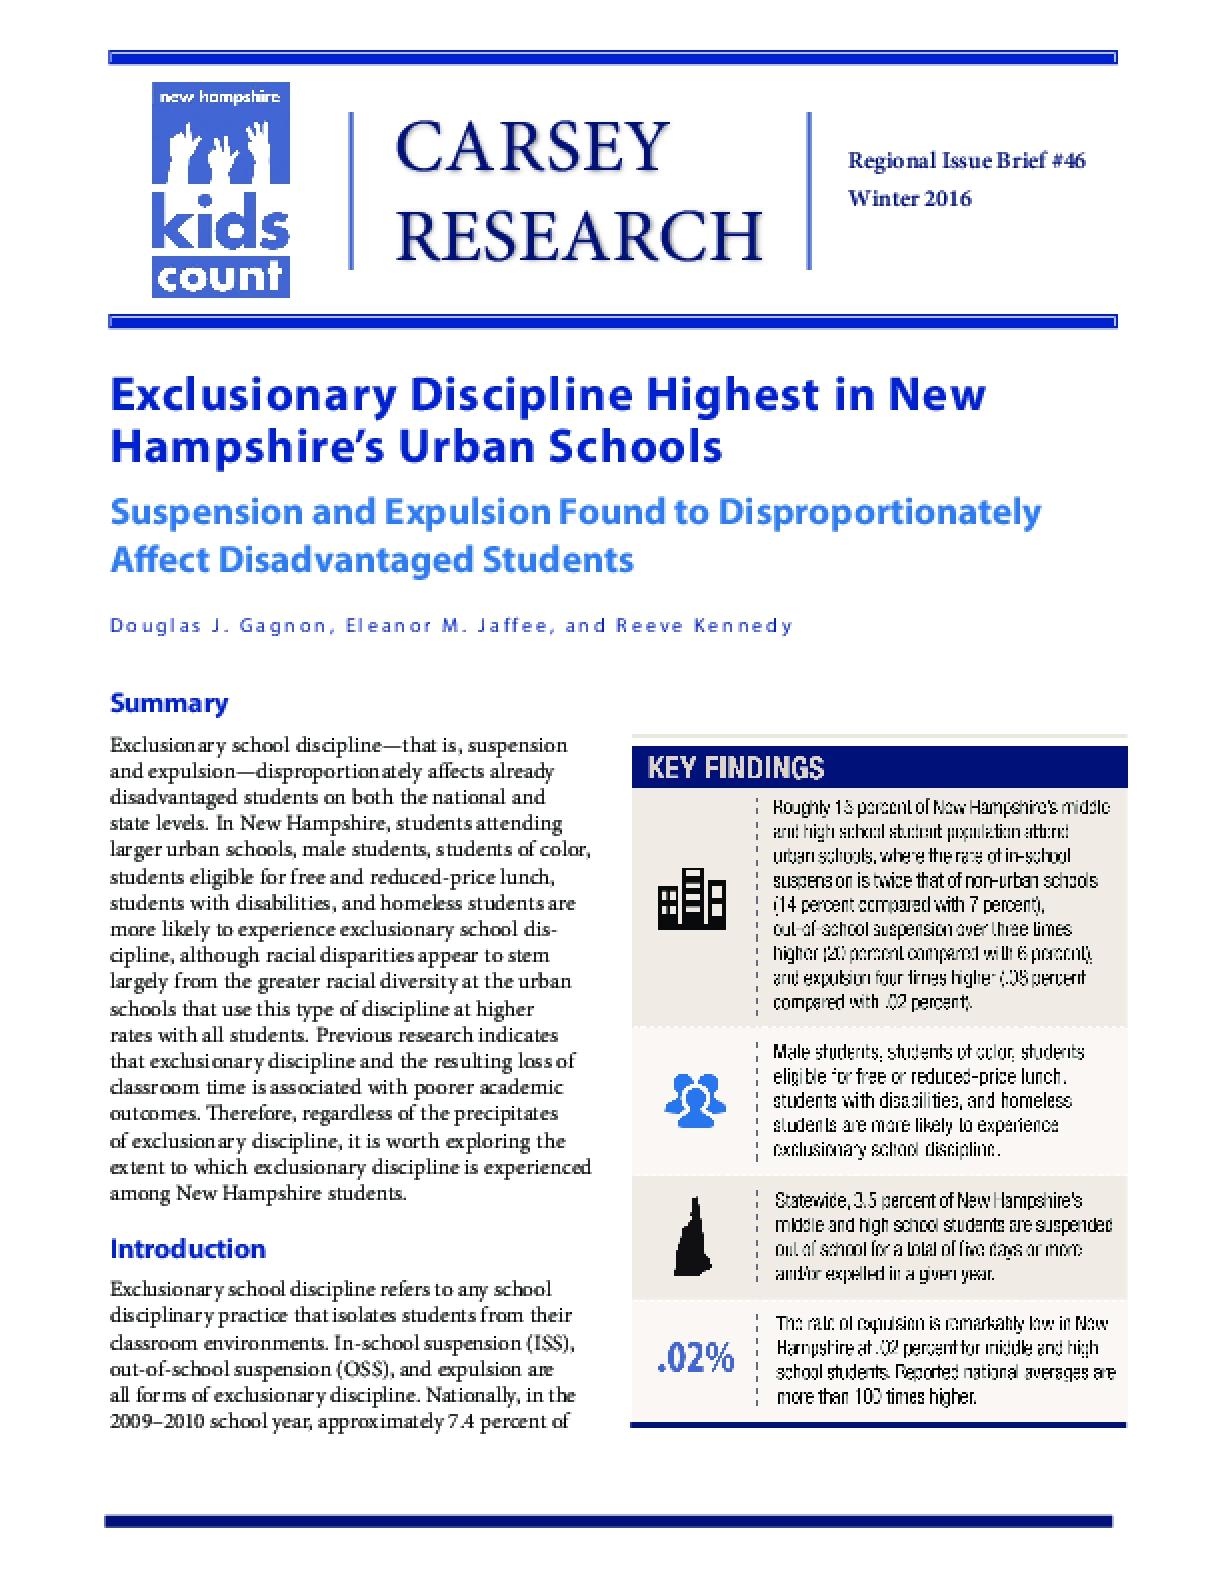 Exclusionary Discipline Highest in New Hampshire's Urban Schools